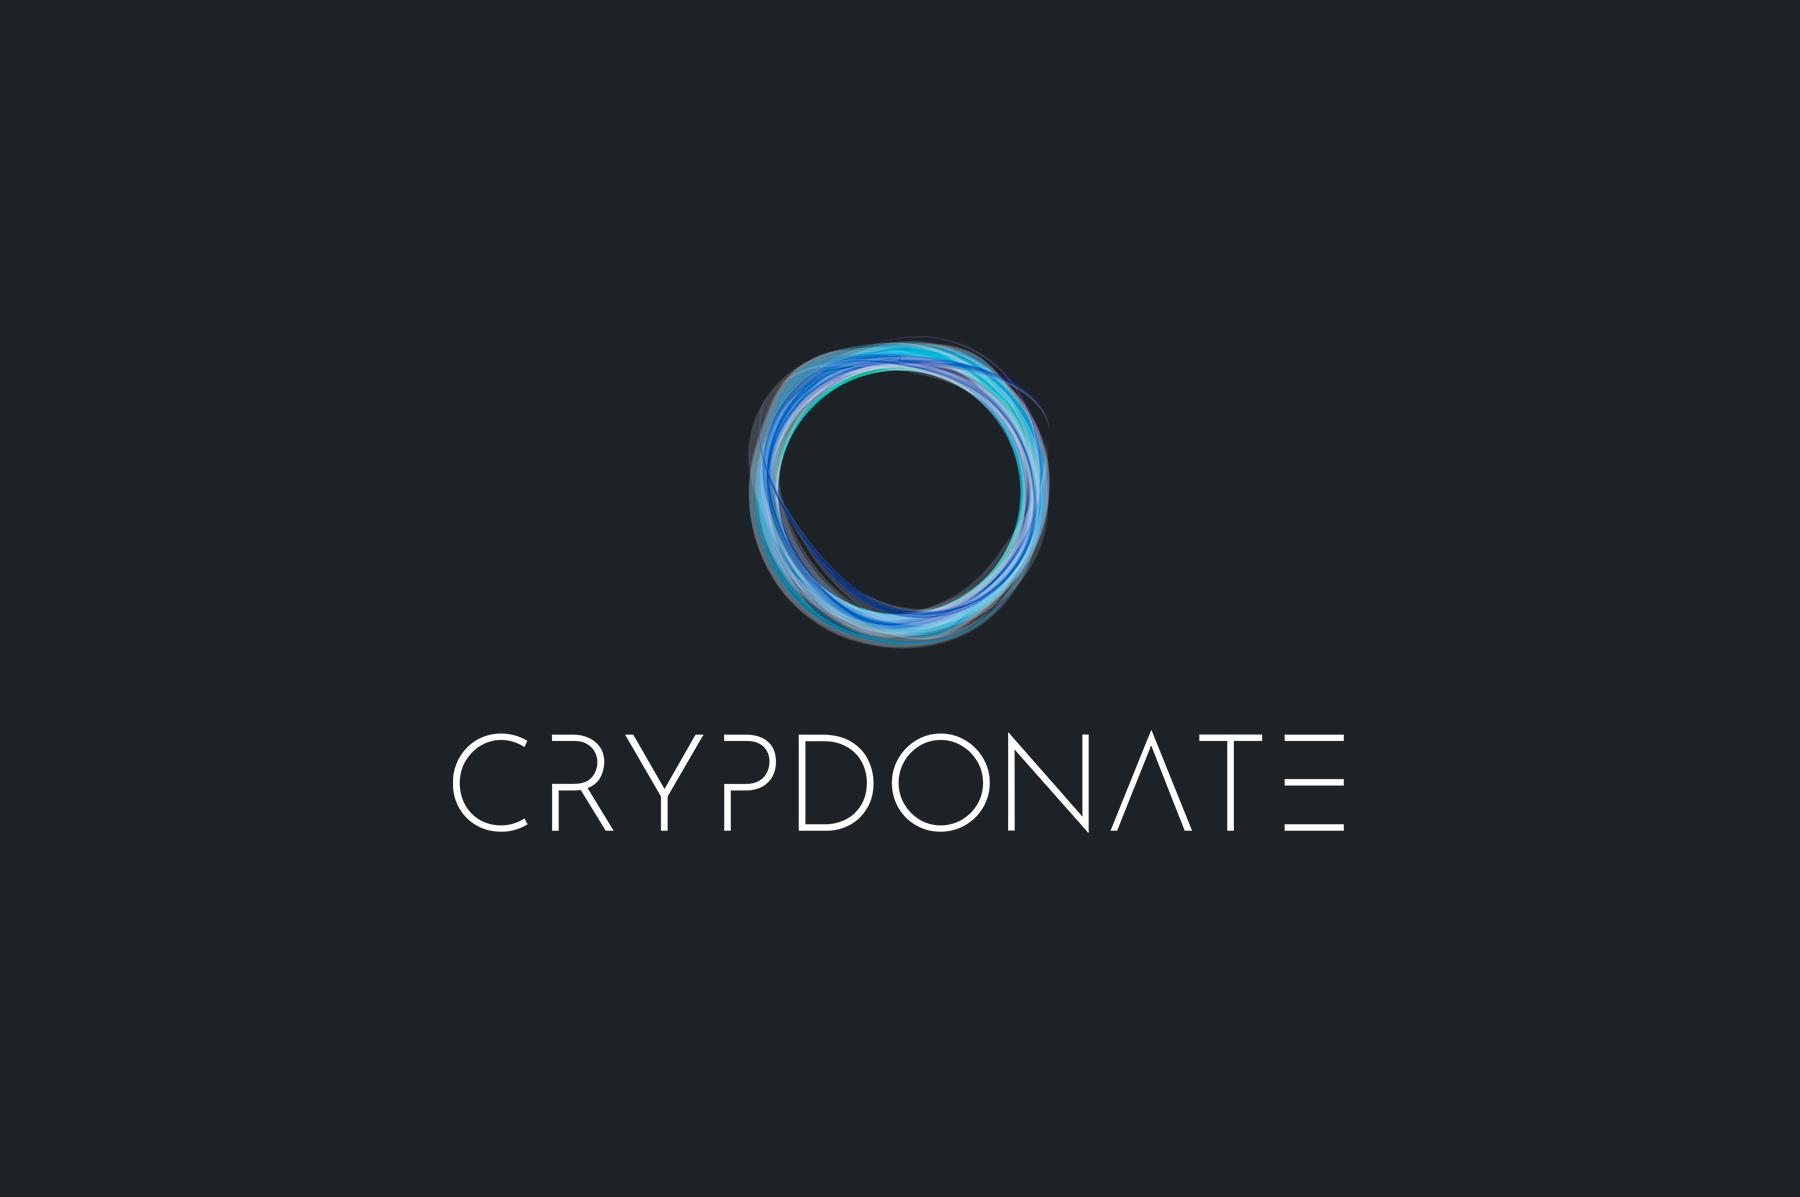 Crypdonate Branding